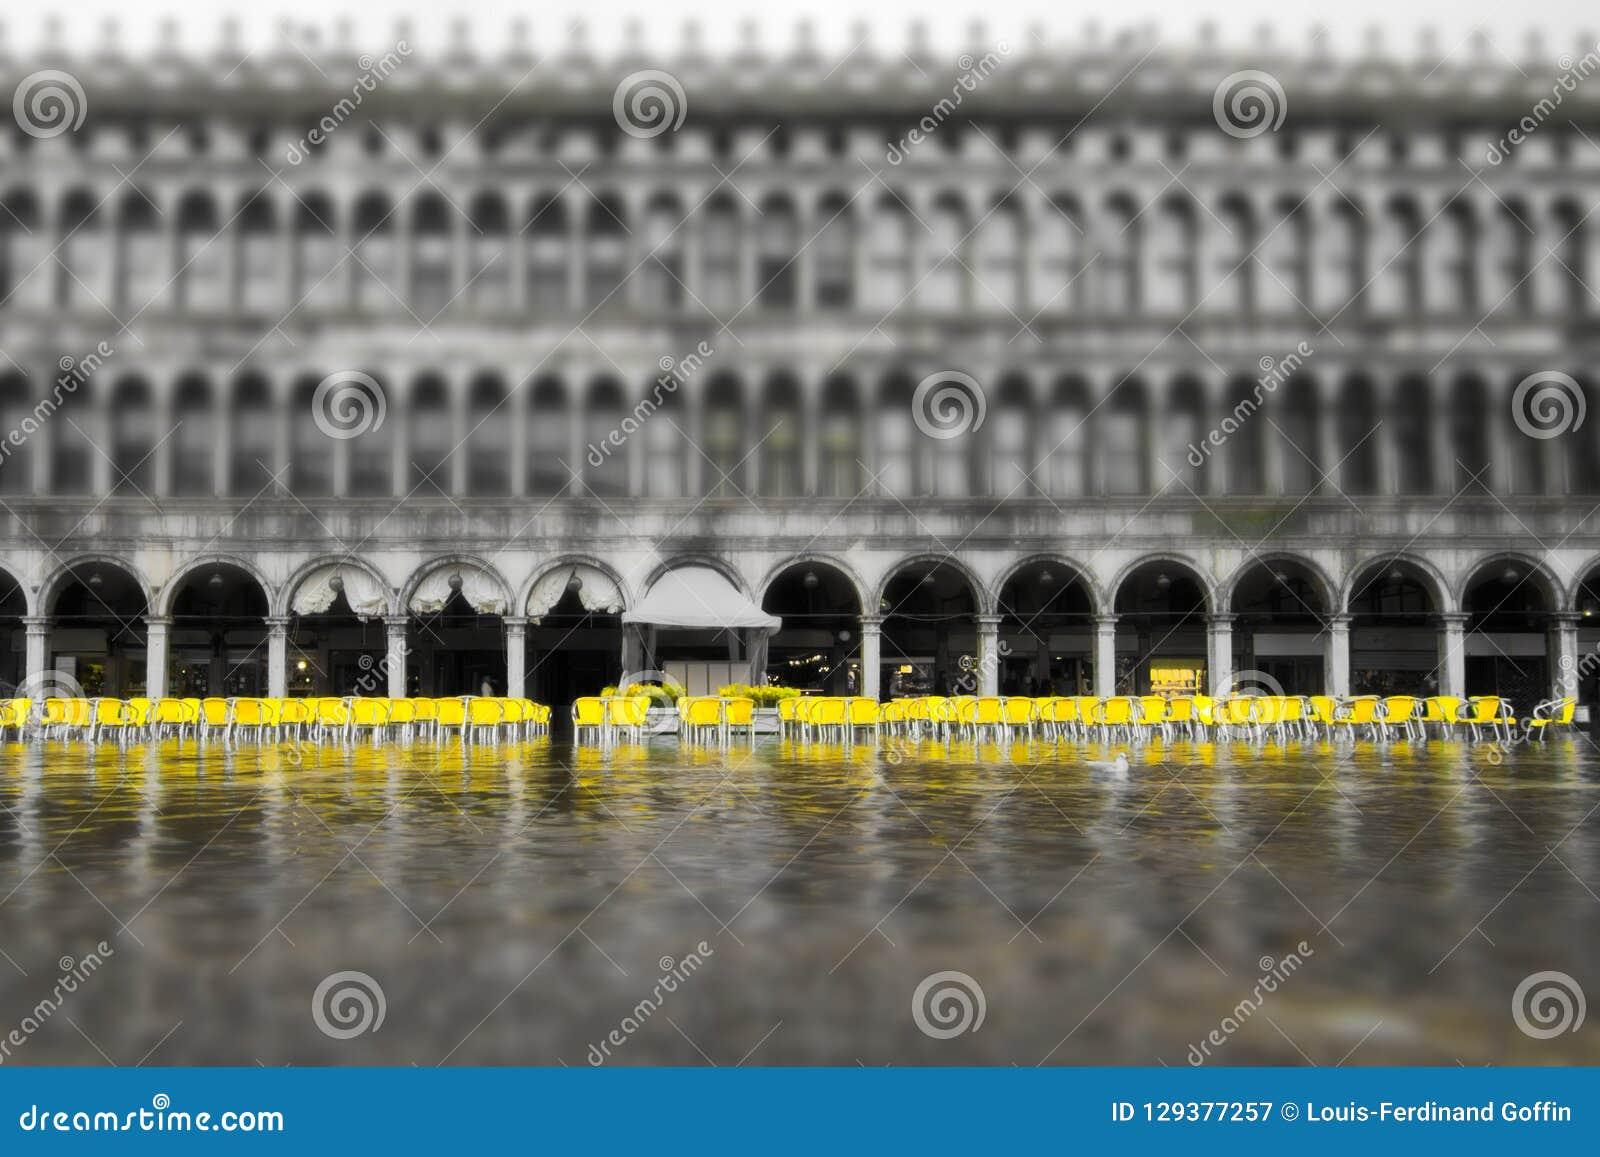 Sommergendosi su San Marco Square